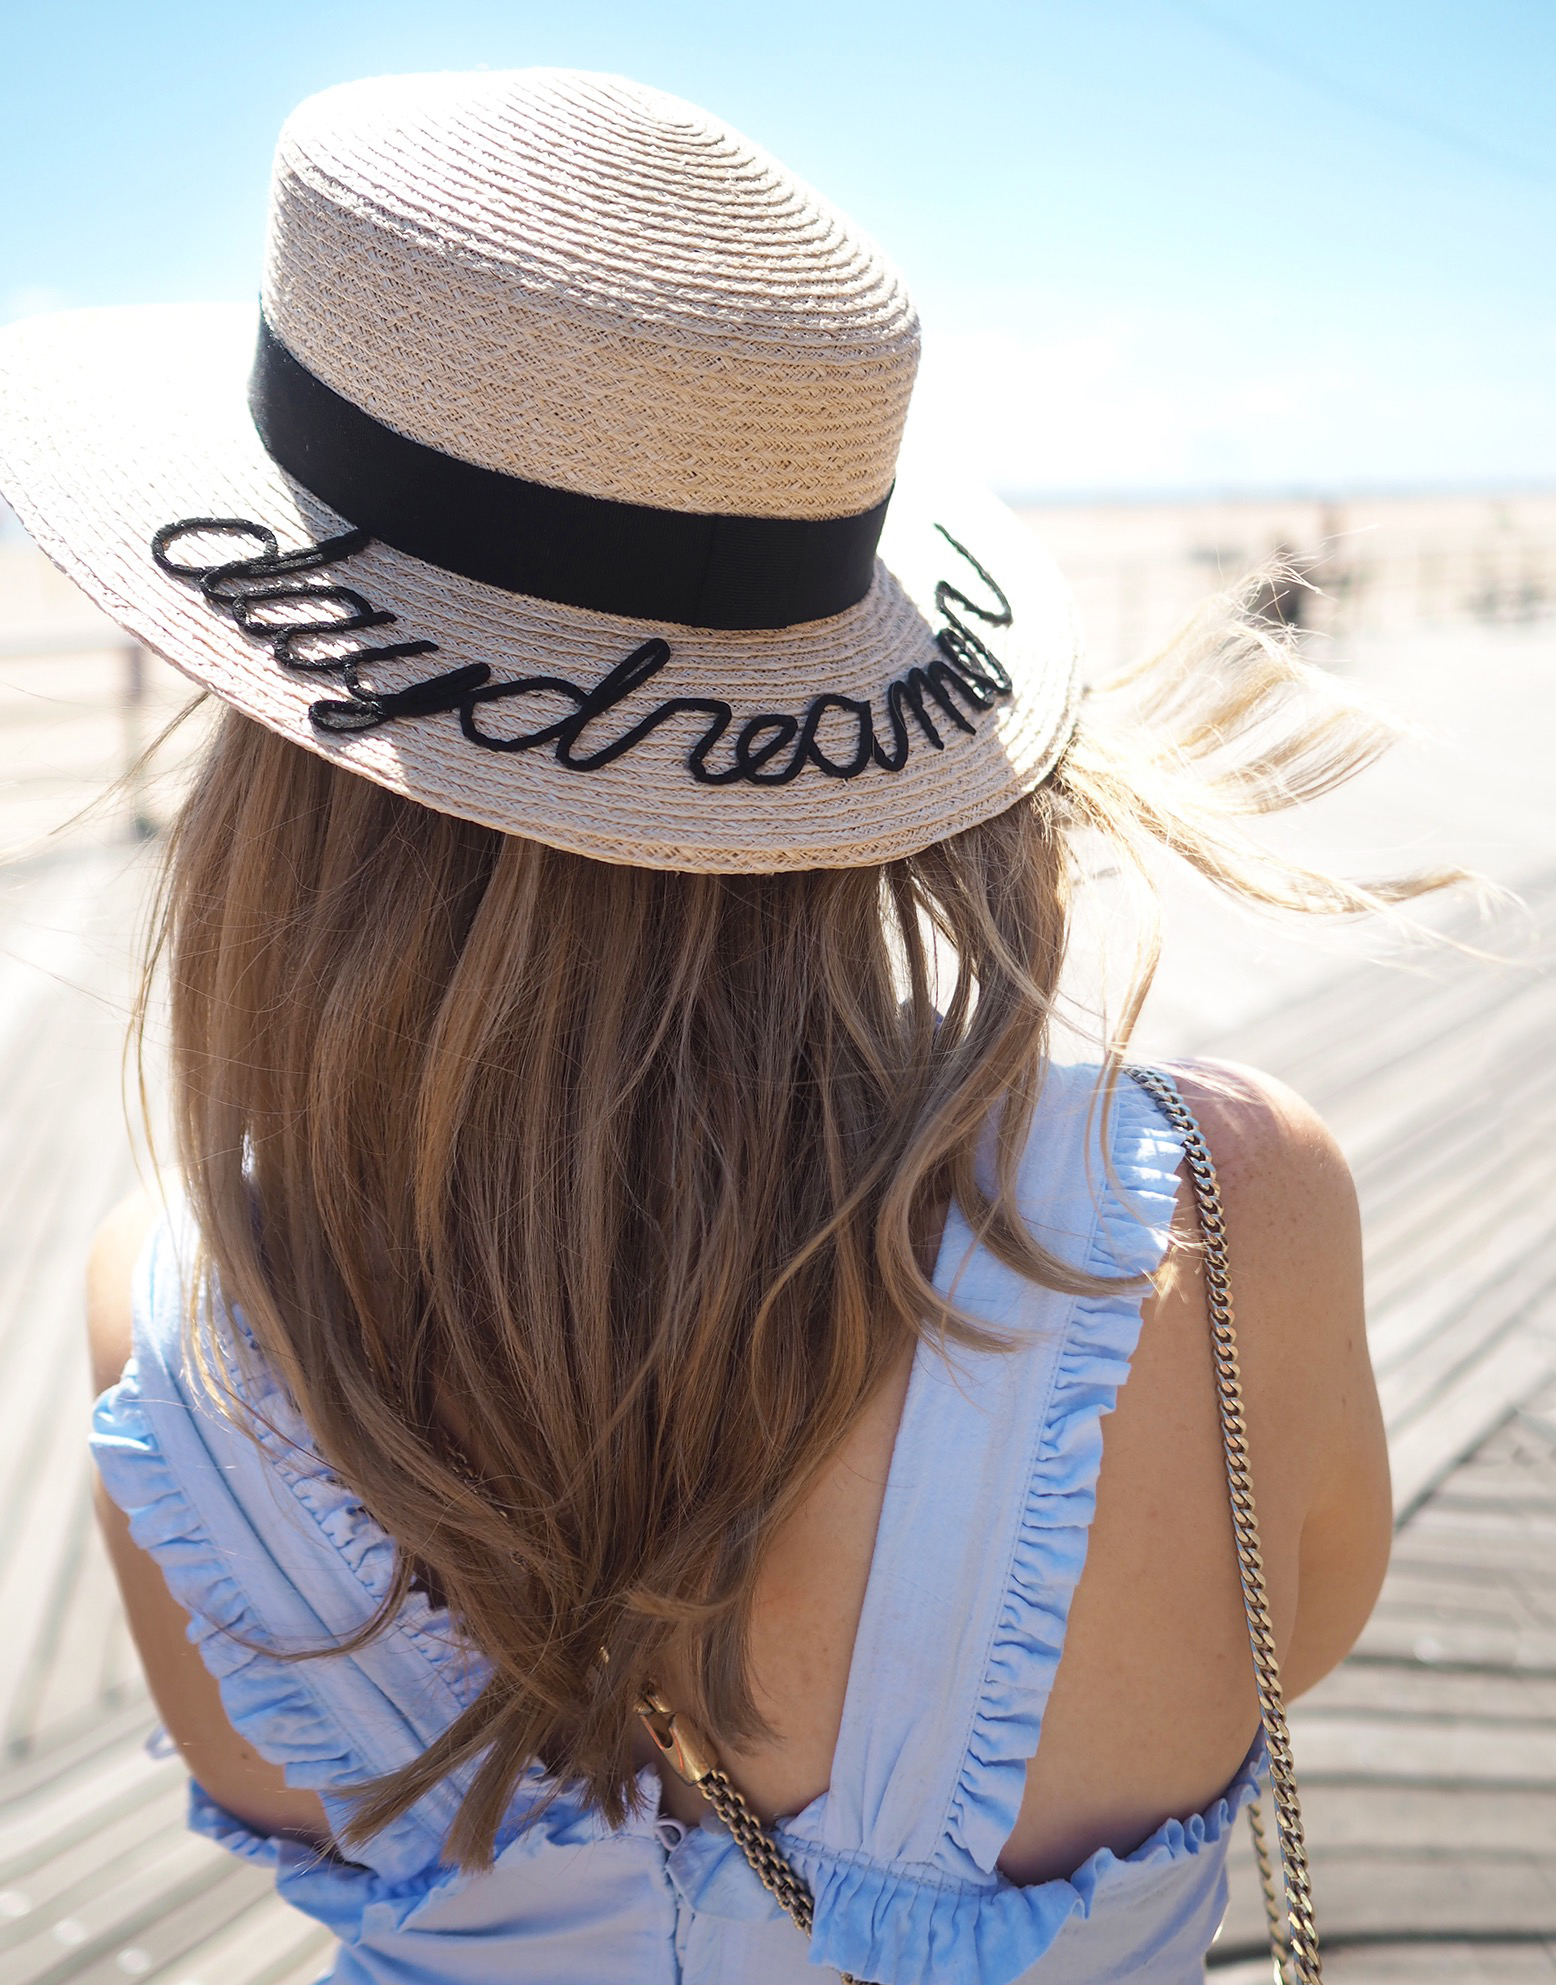 coney island new york beach boardwalk